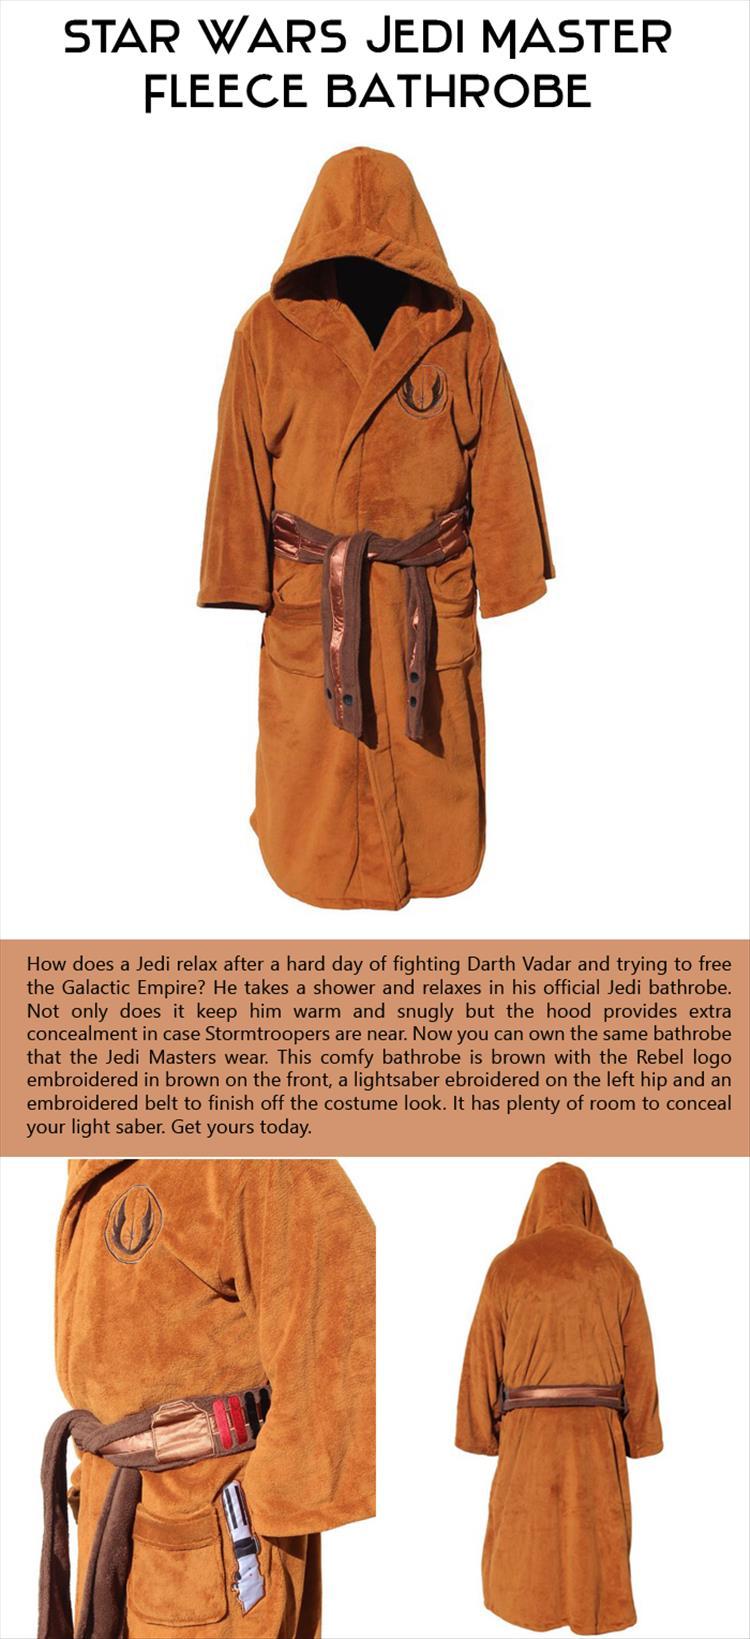 Star Wars Jedi Master Fleece Bathrobe